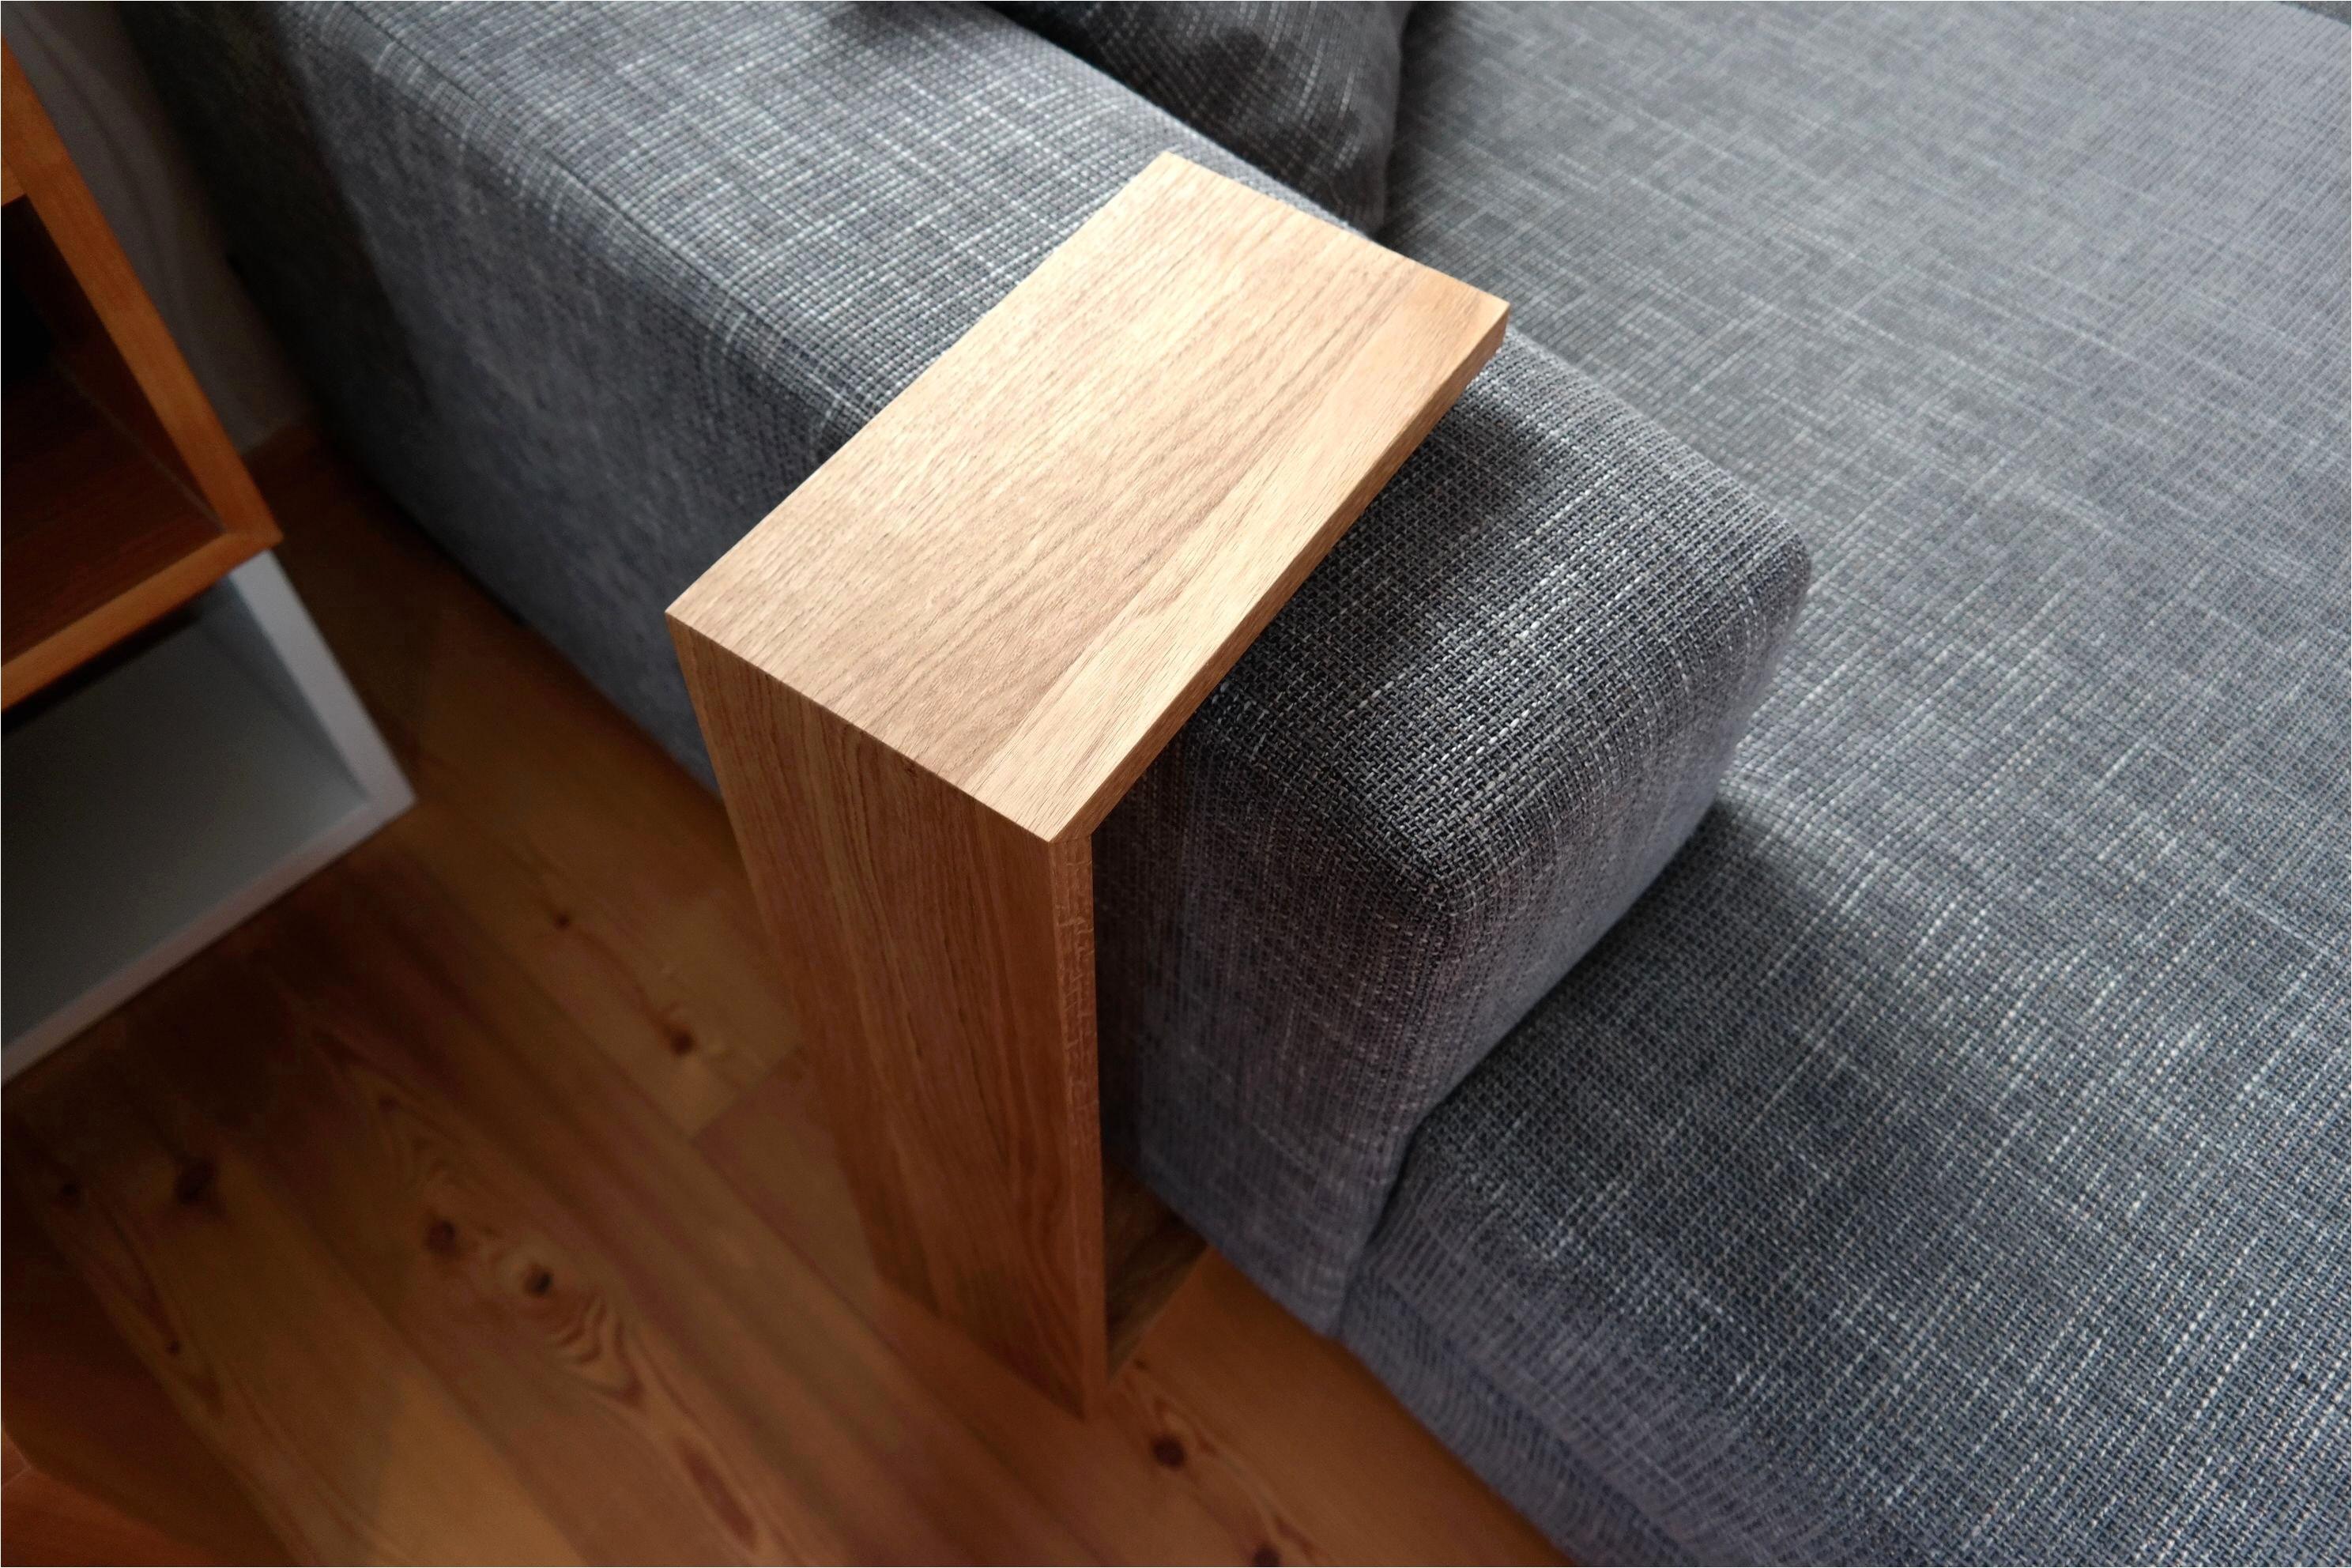 Wood Floor Removal Machine Hardwood Floor Removal Machine Podemosleganes